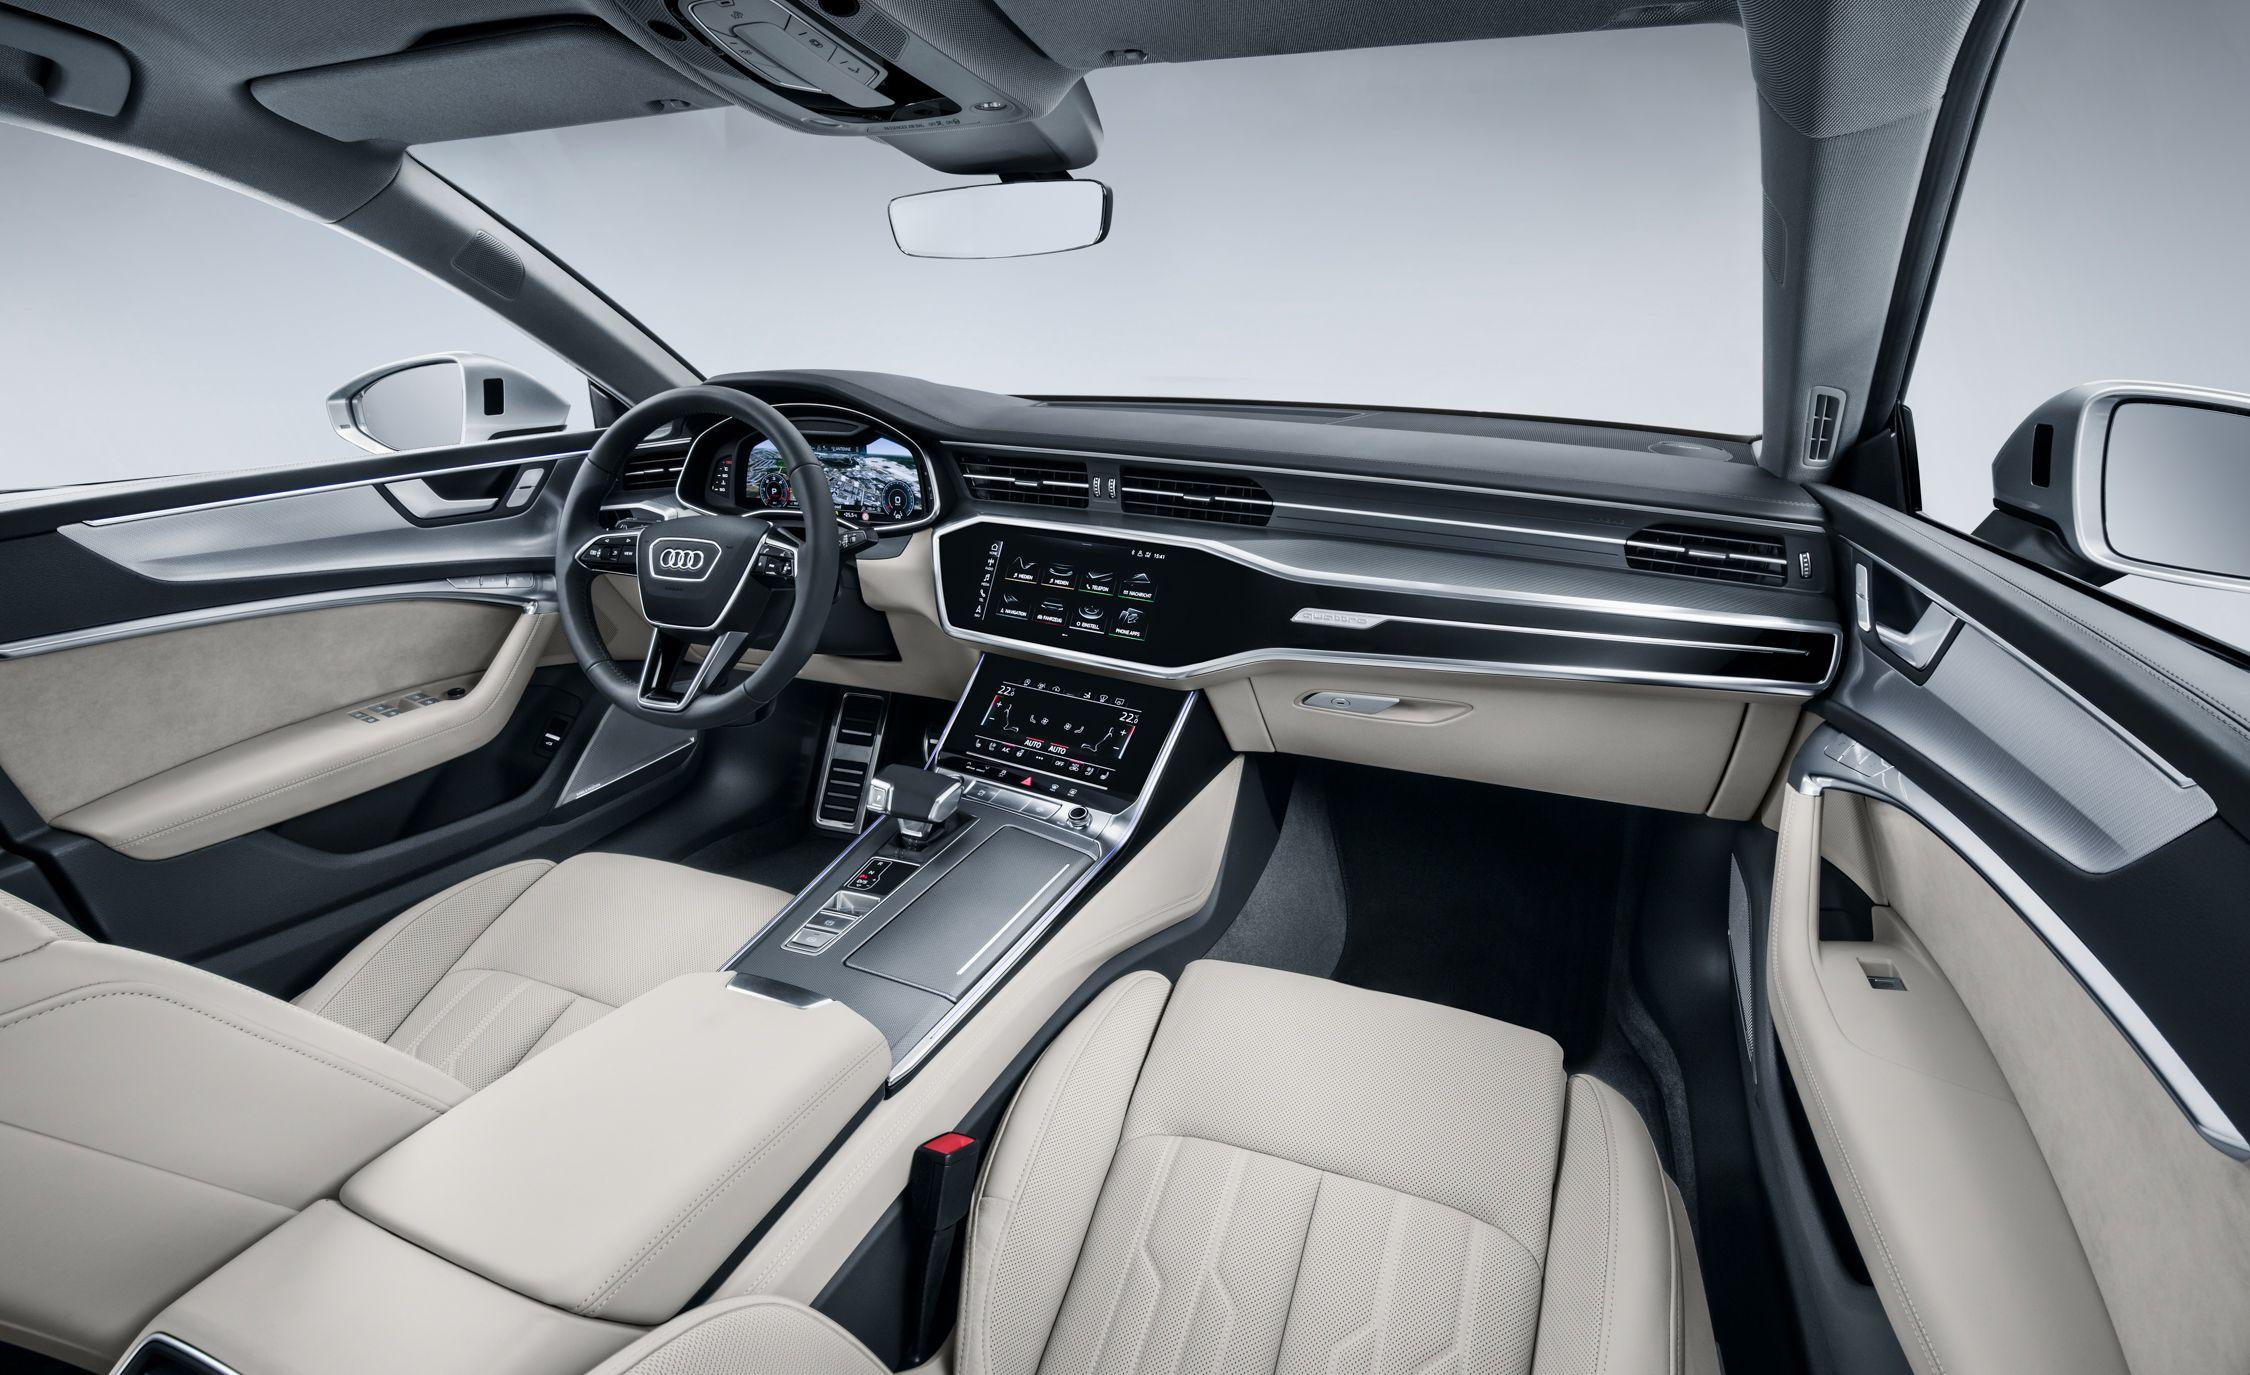 2019-Audi-A7-Sportback-157-1.jpg